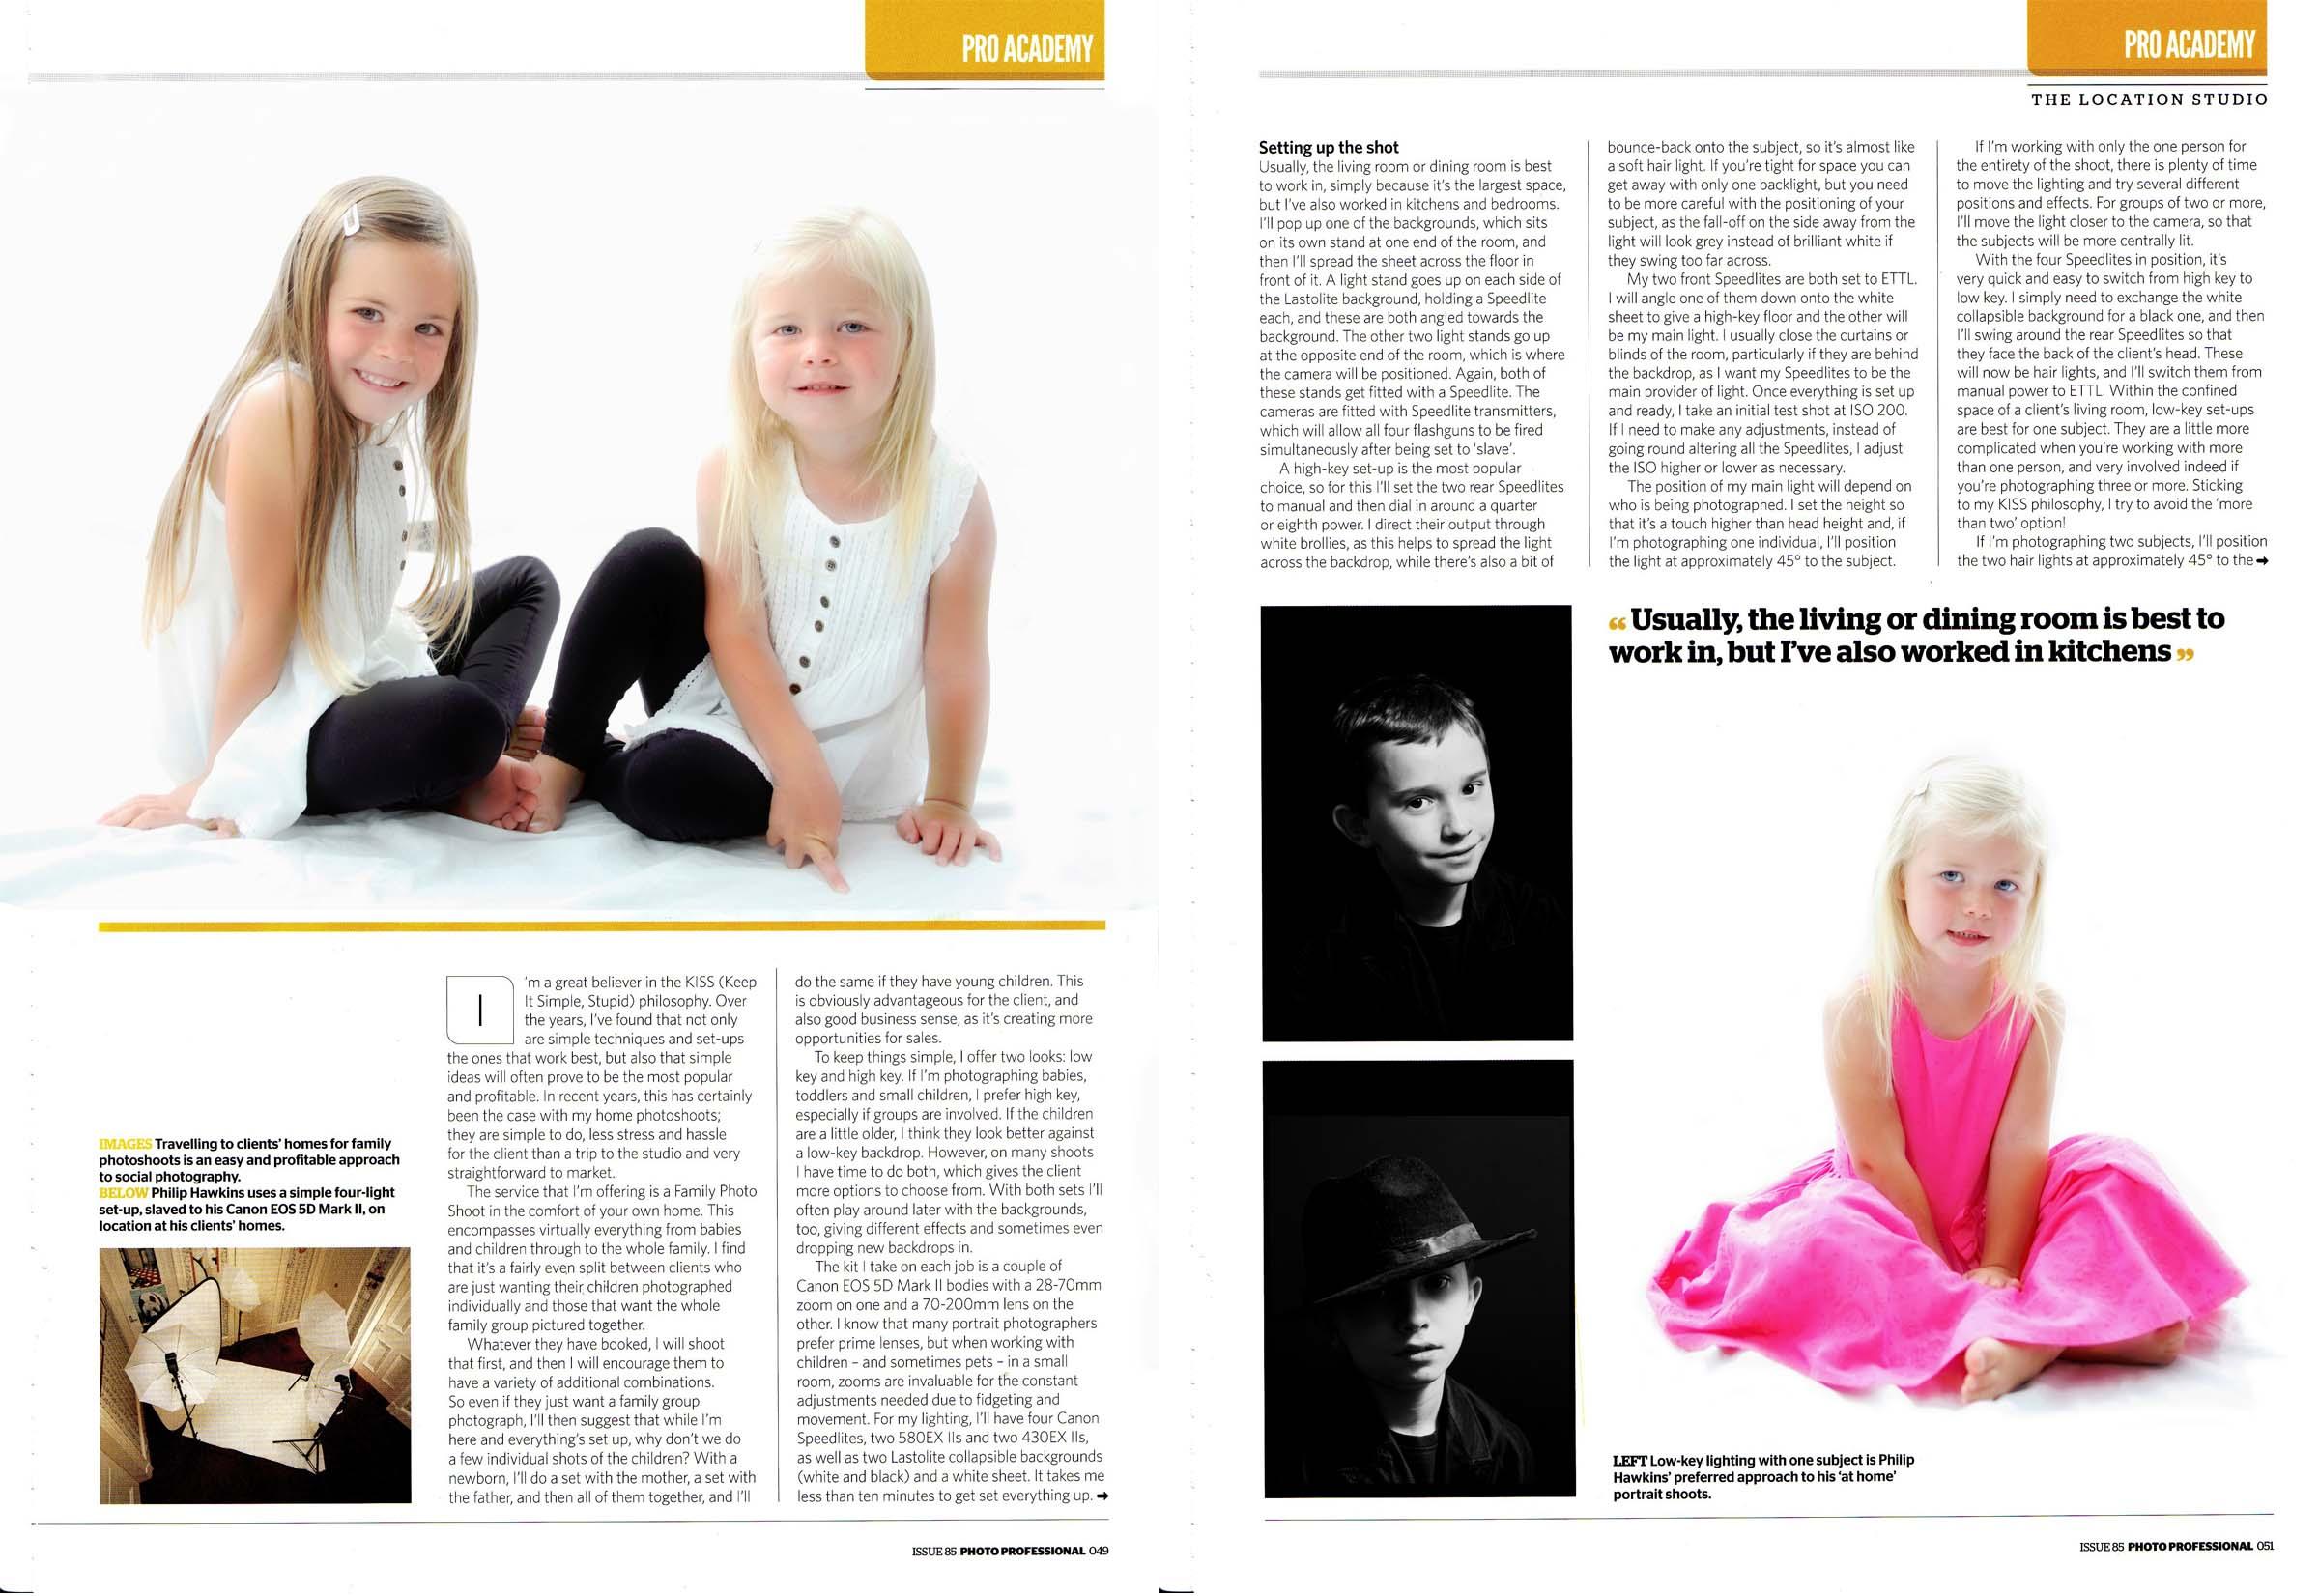 Professional Photo magazine article for professional photographers